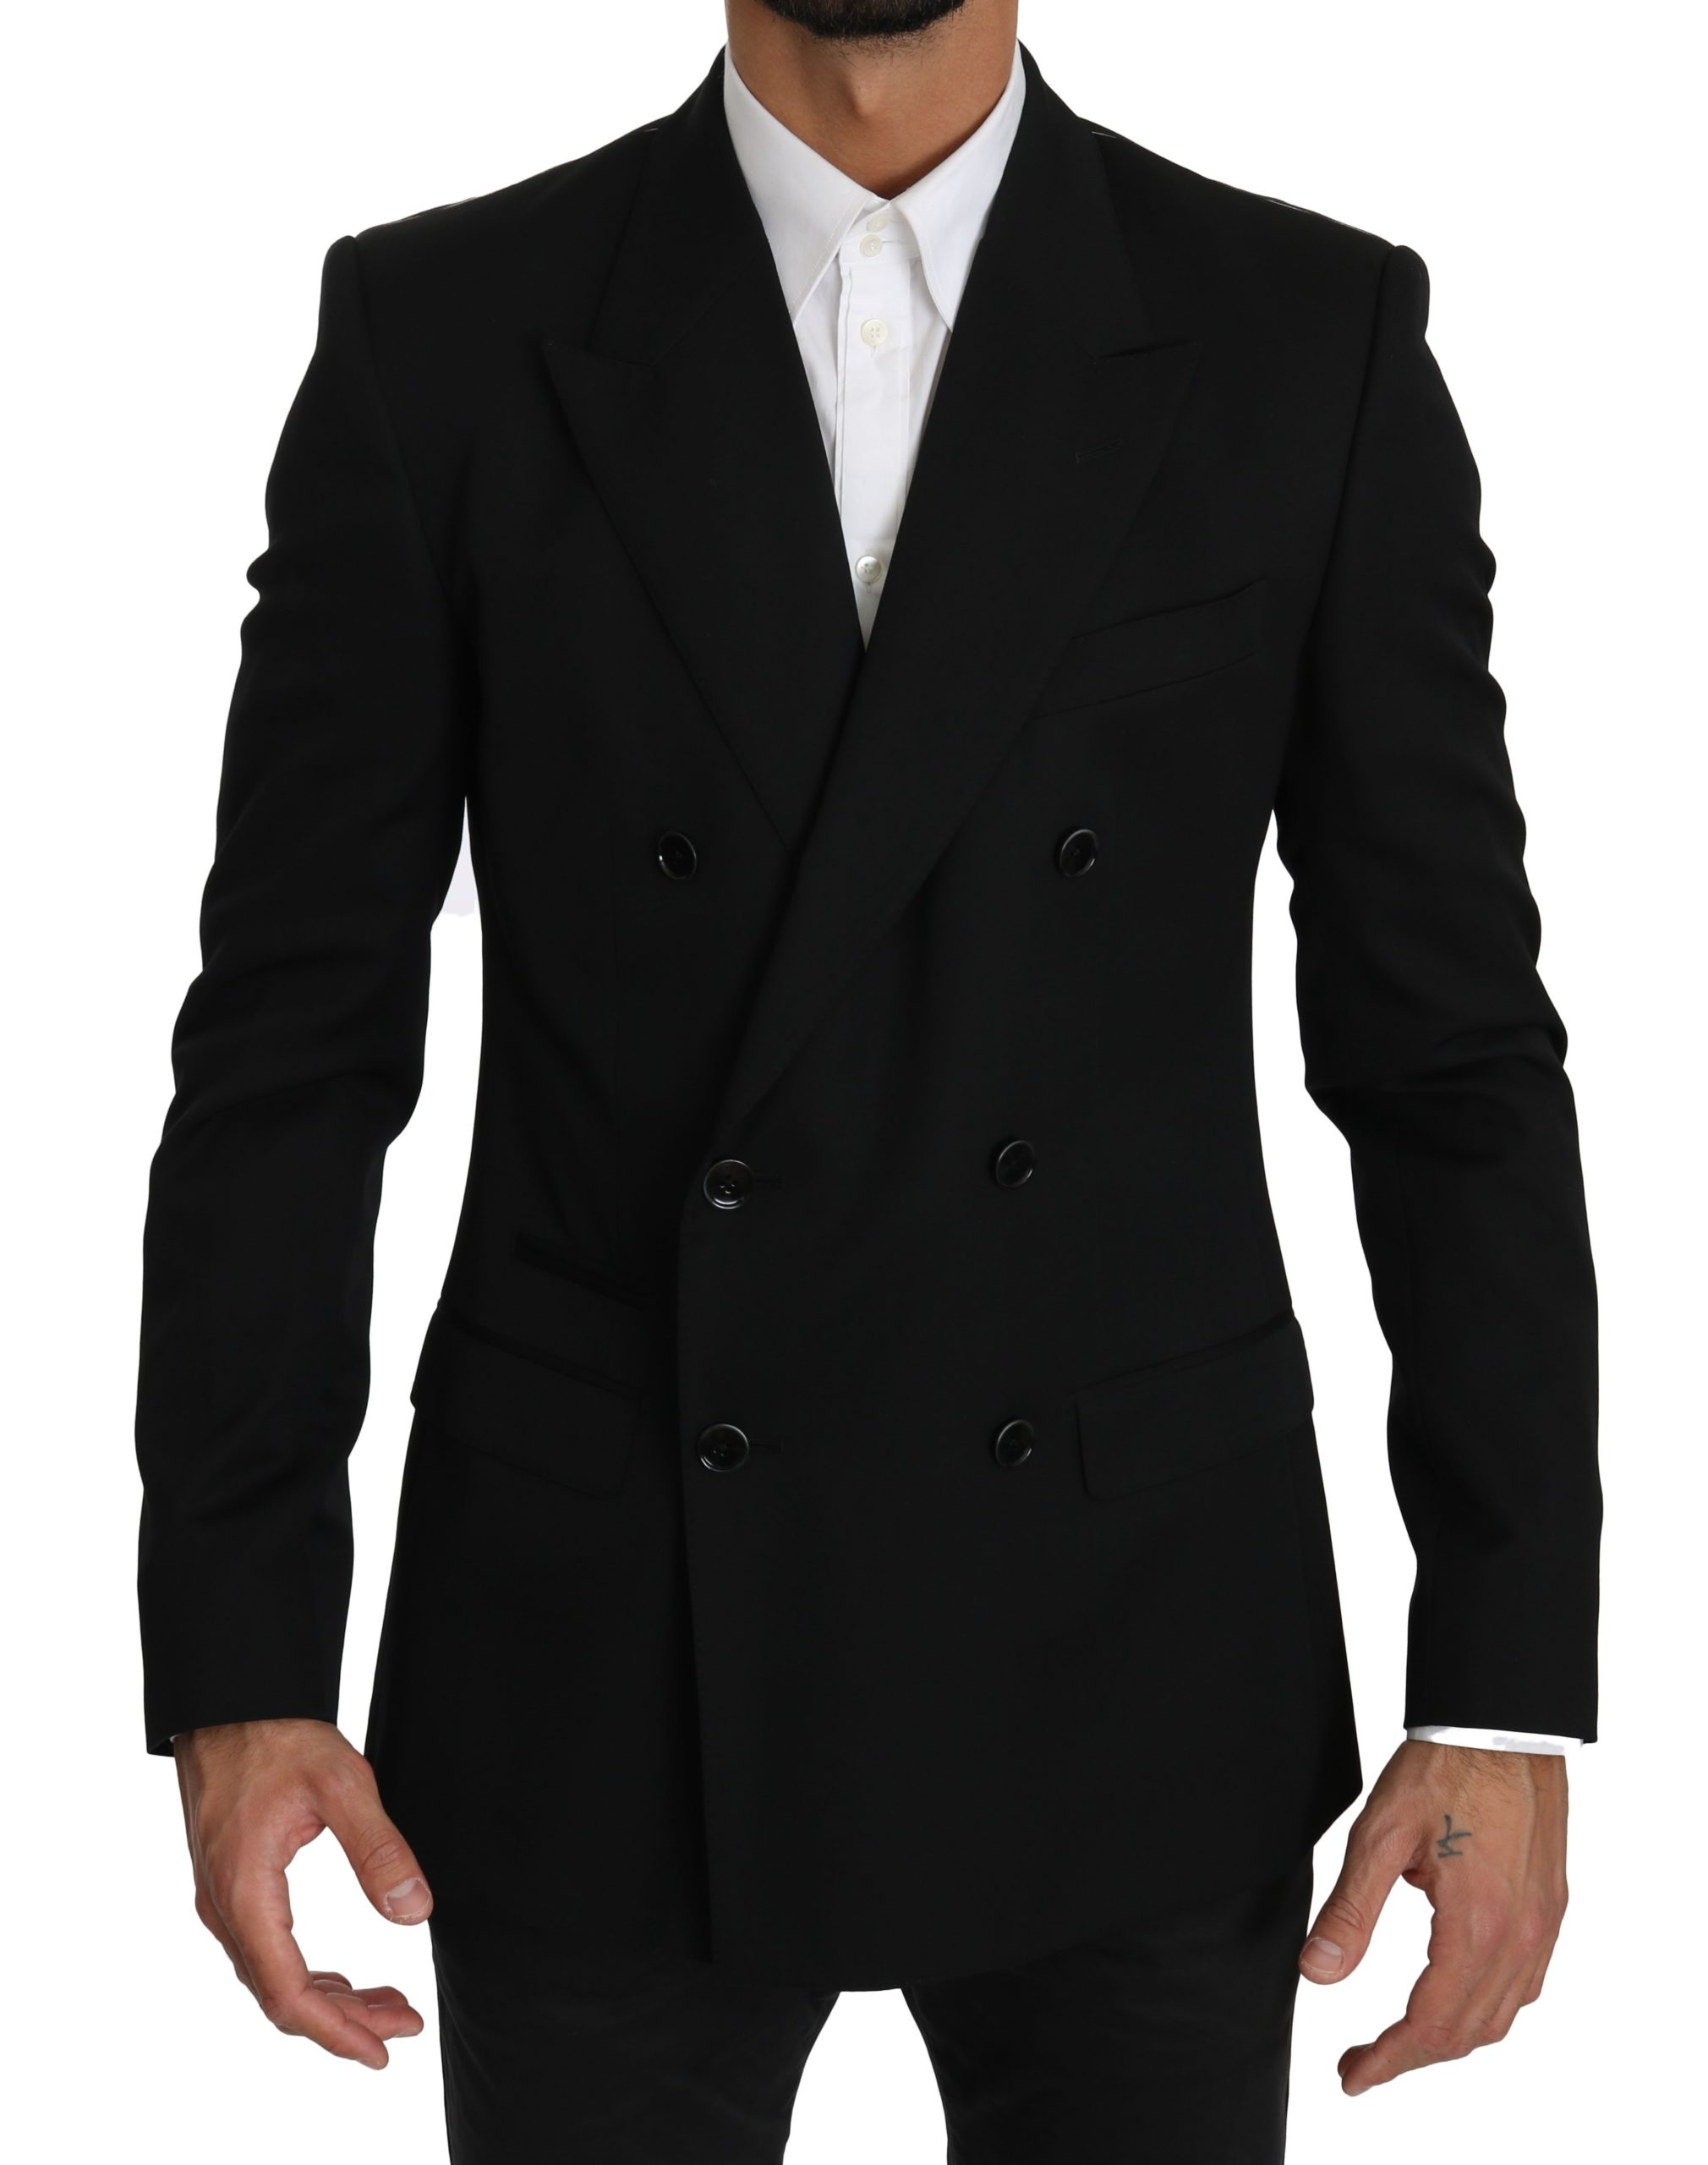 Dolce & Gabbana Men's Double Breasted SICILIA Blazer Black JKT2484 - IT48 | M